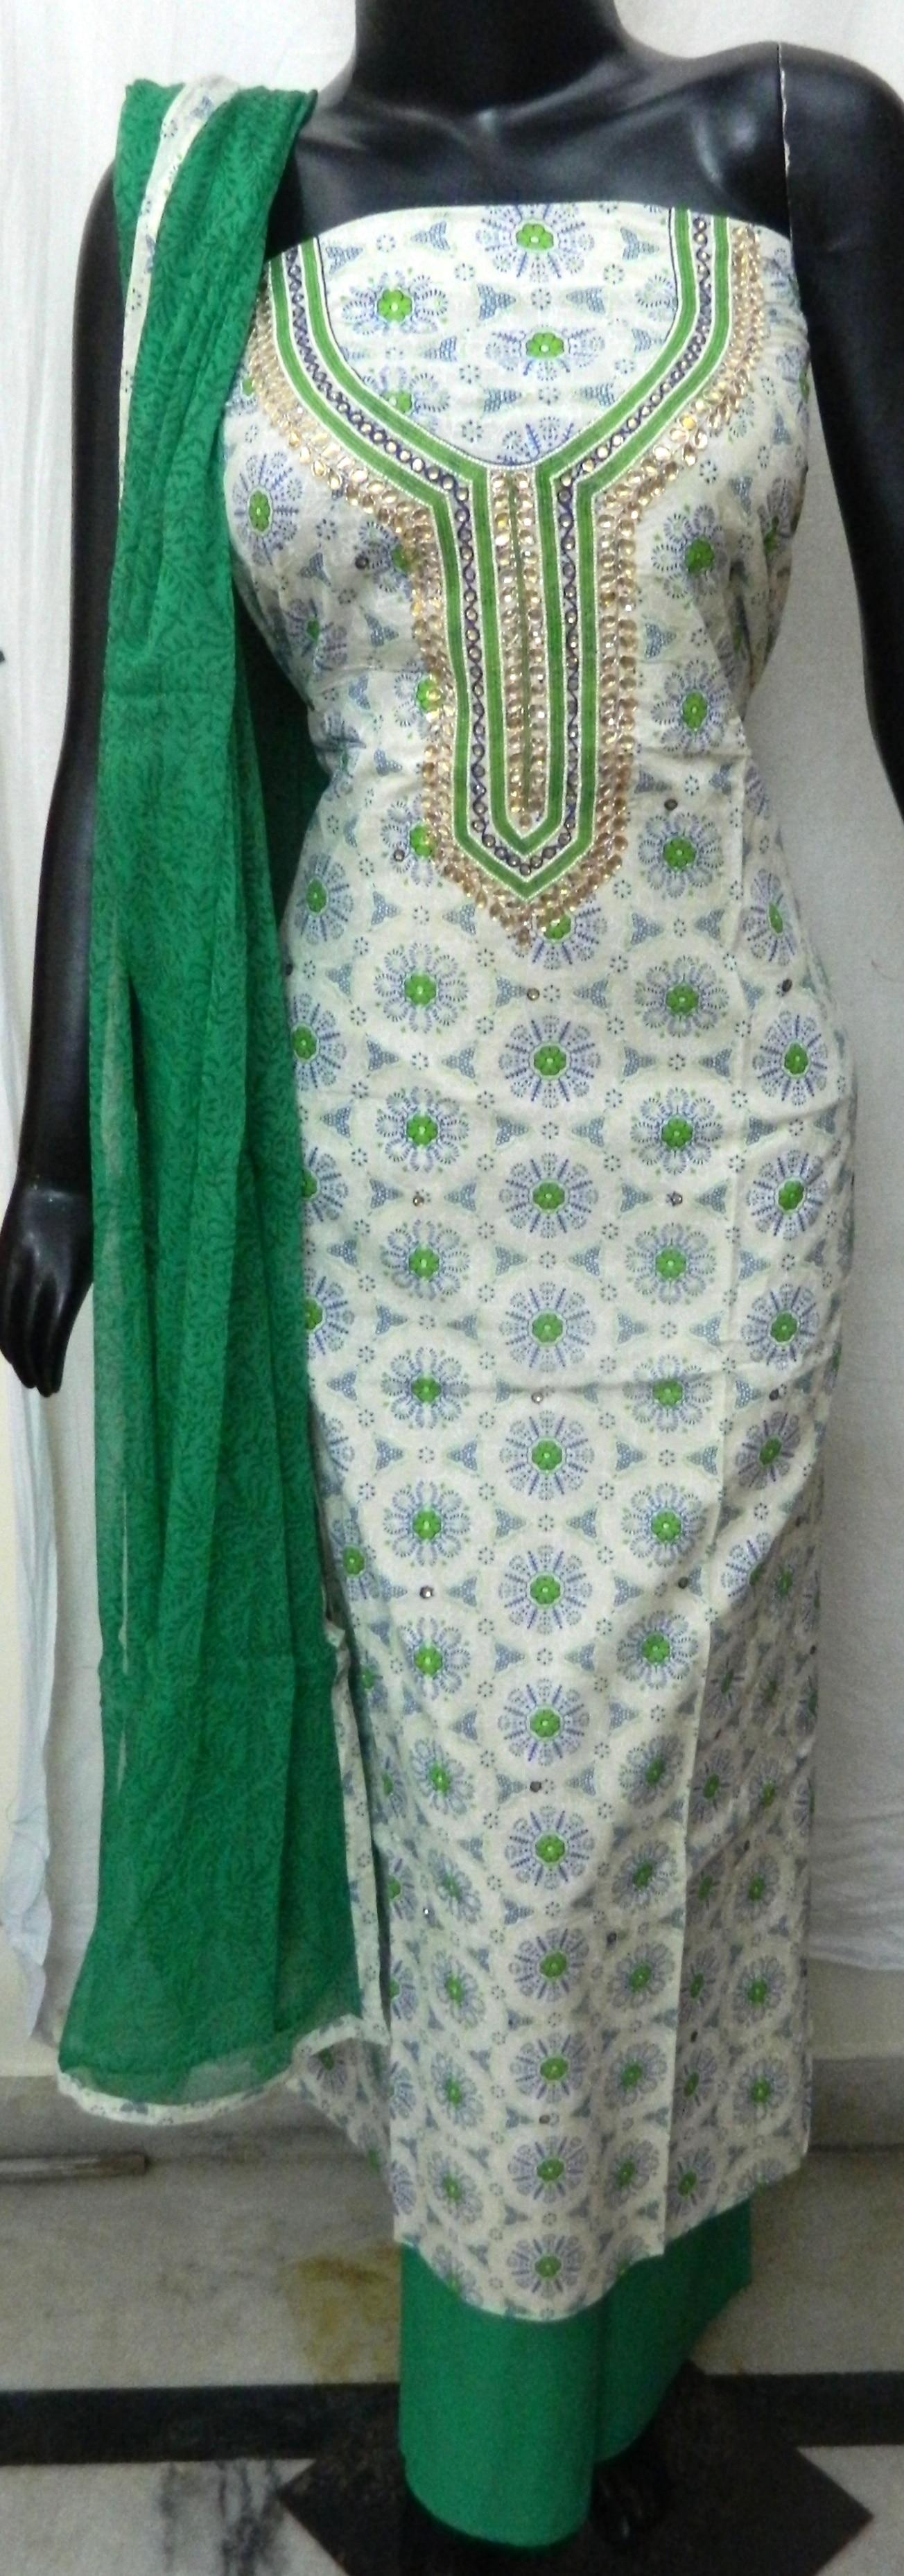 Aari Work Salwar suits - Aari Work Suits Manufacturer from Jaipur